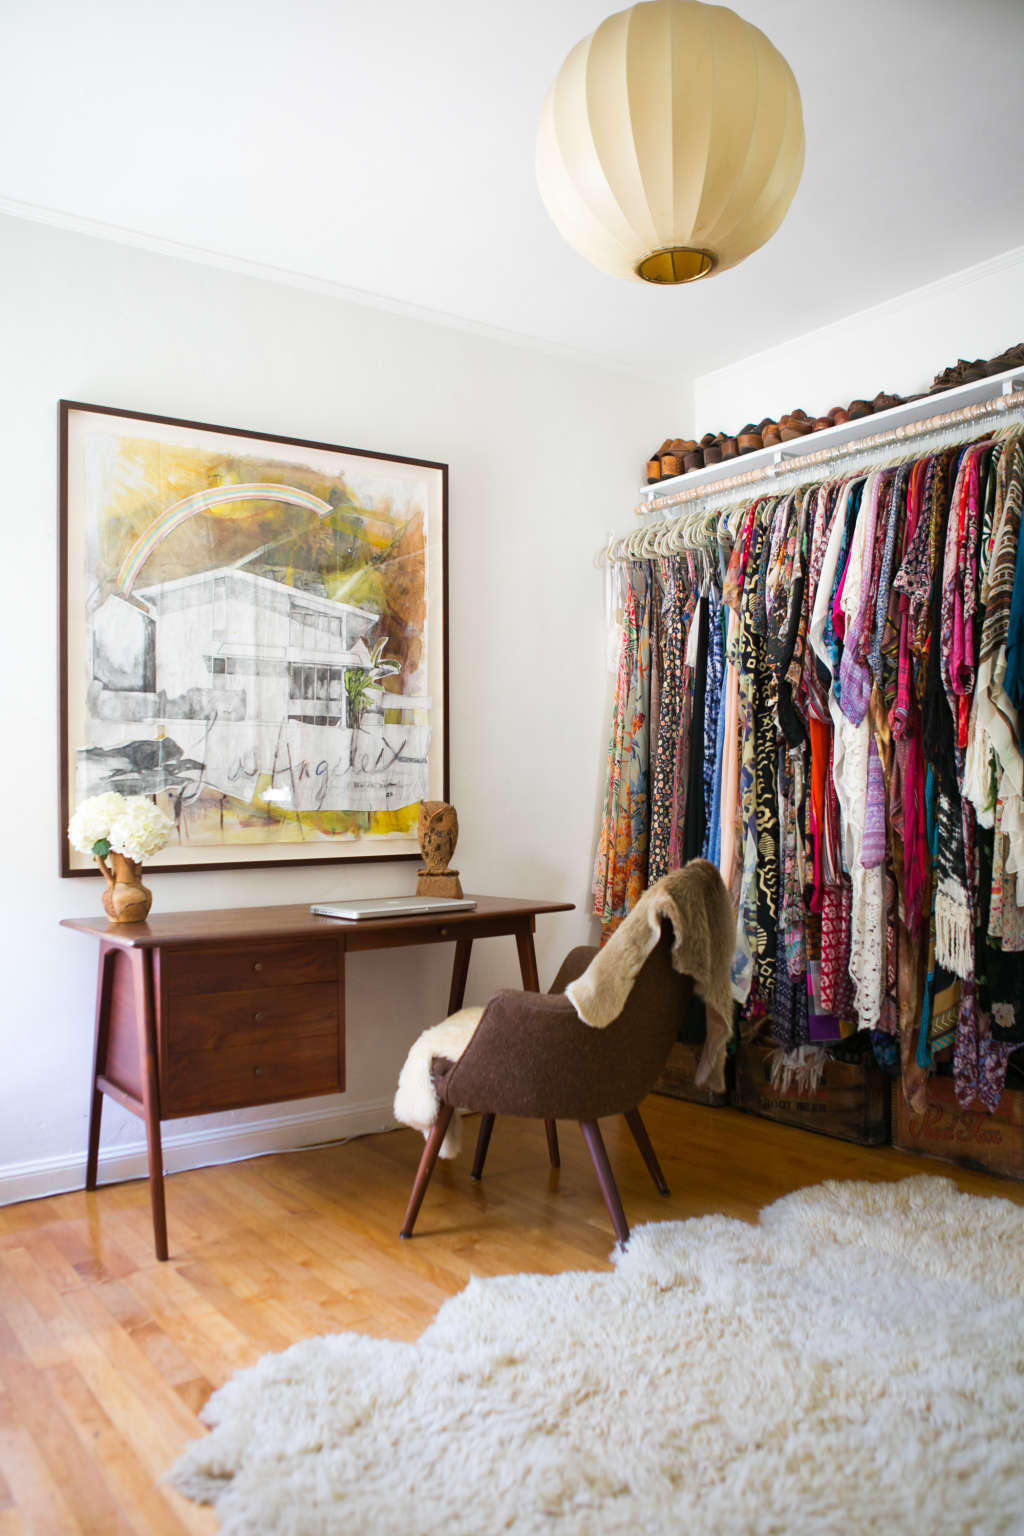 6 Ways to Make Being Organized Easier